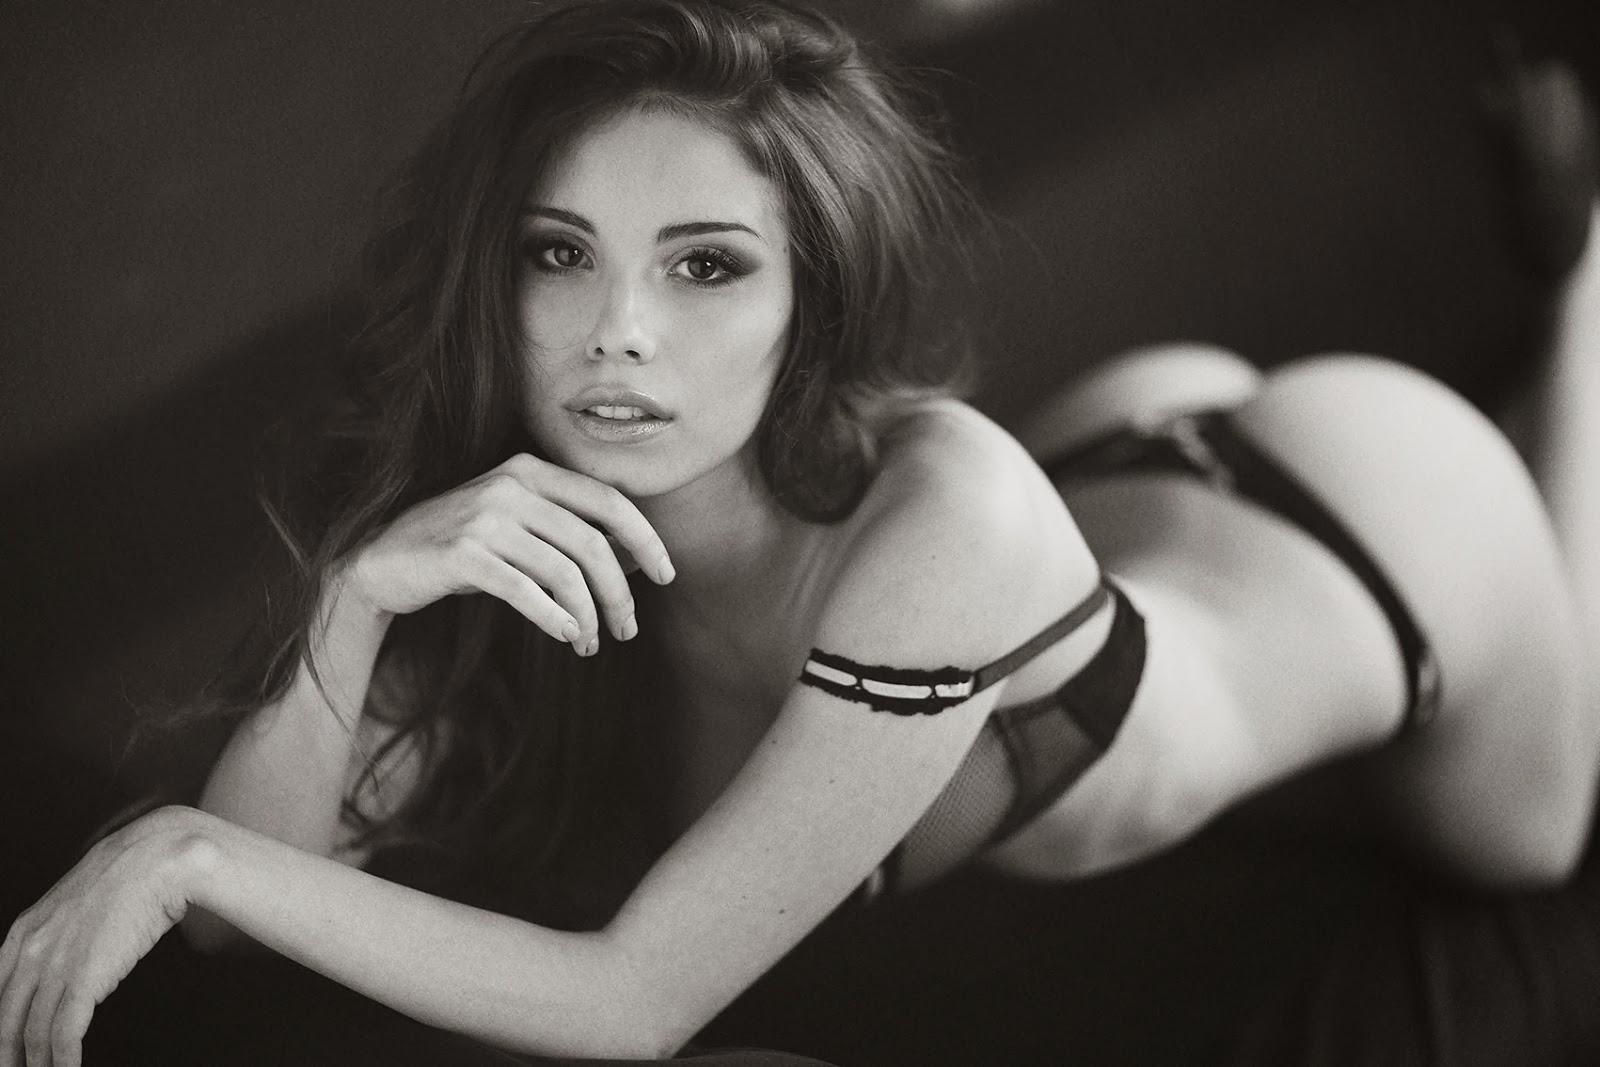 Selfie Chiara Arrighi nude photos 2019